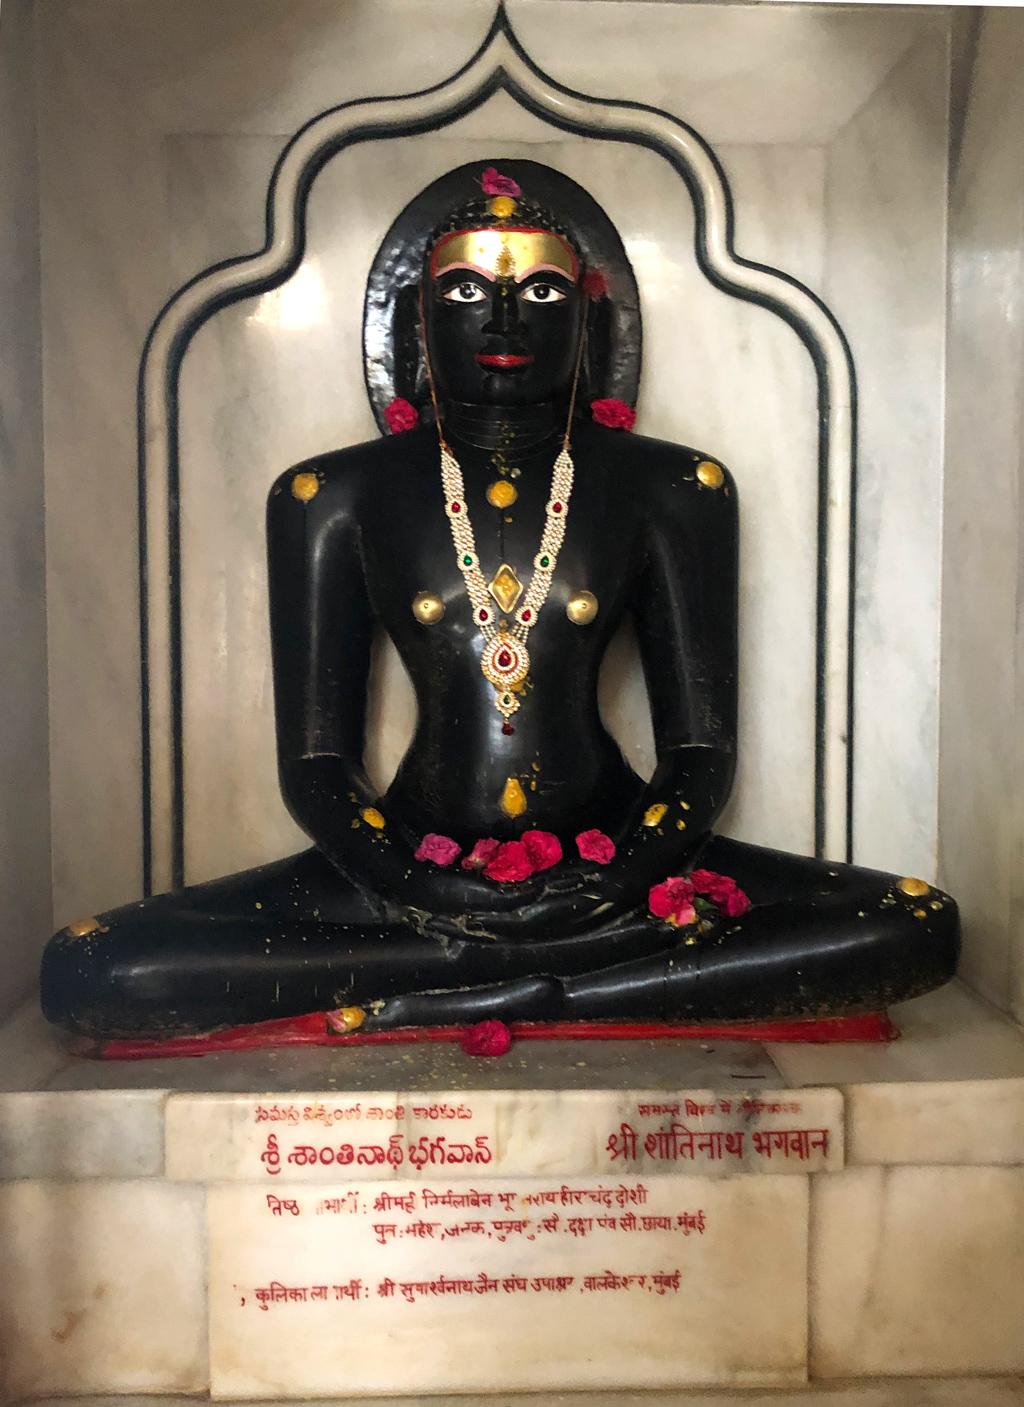 Sri Shanthinath bhagwan's statue in Kulpakji's Jain tirth near Hyderabad.